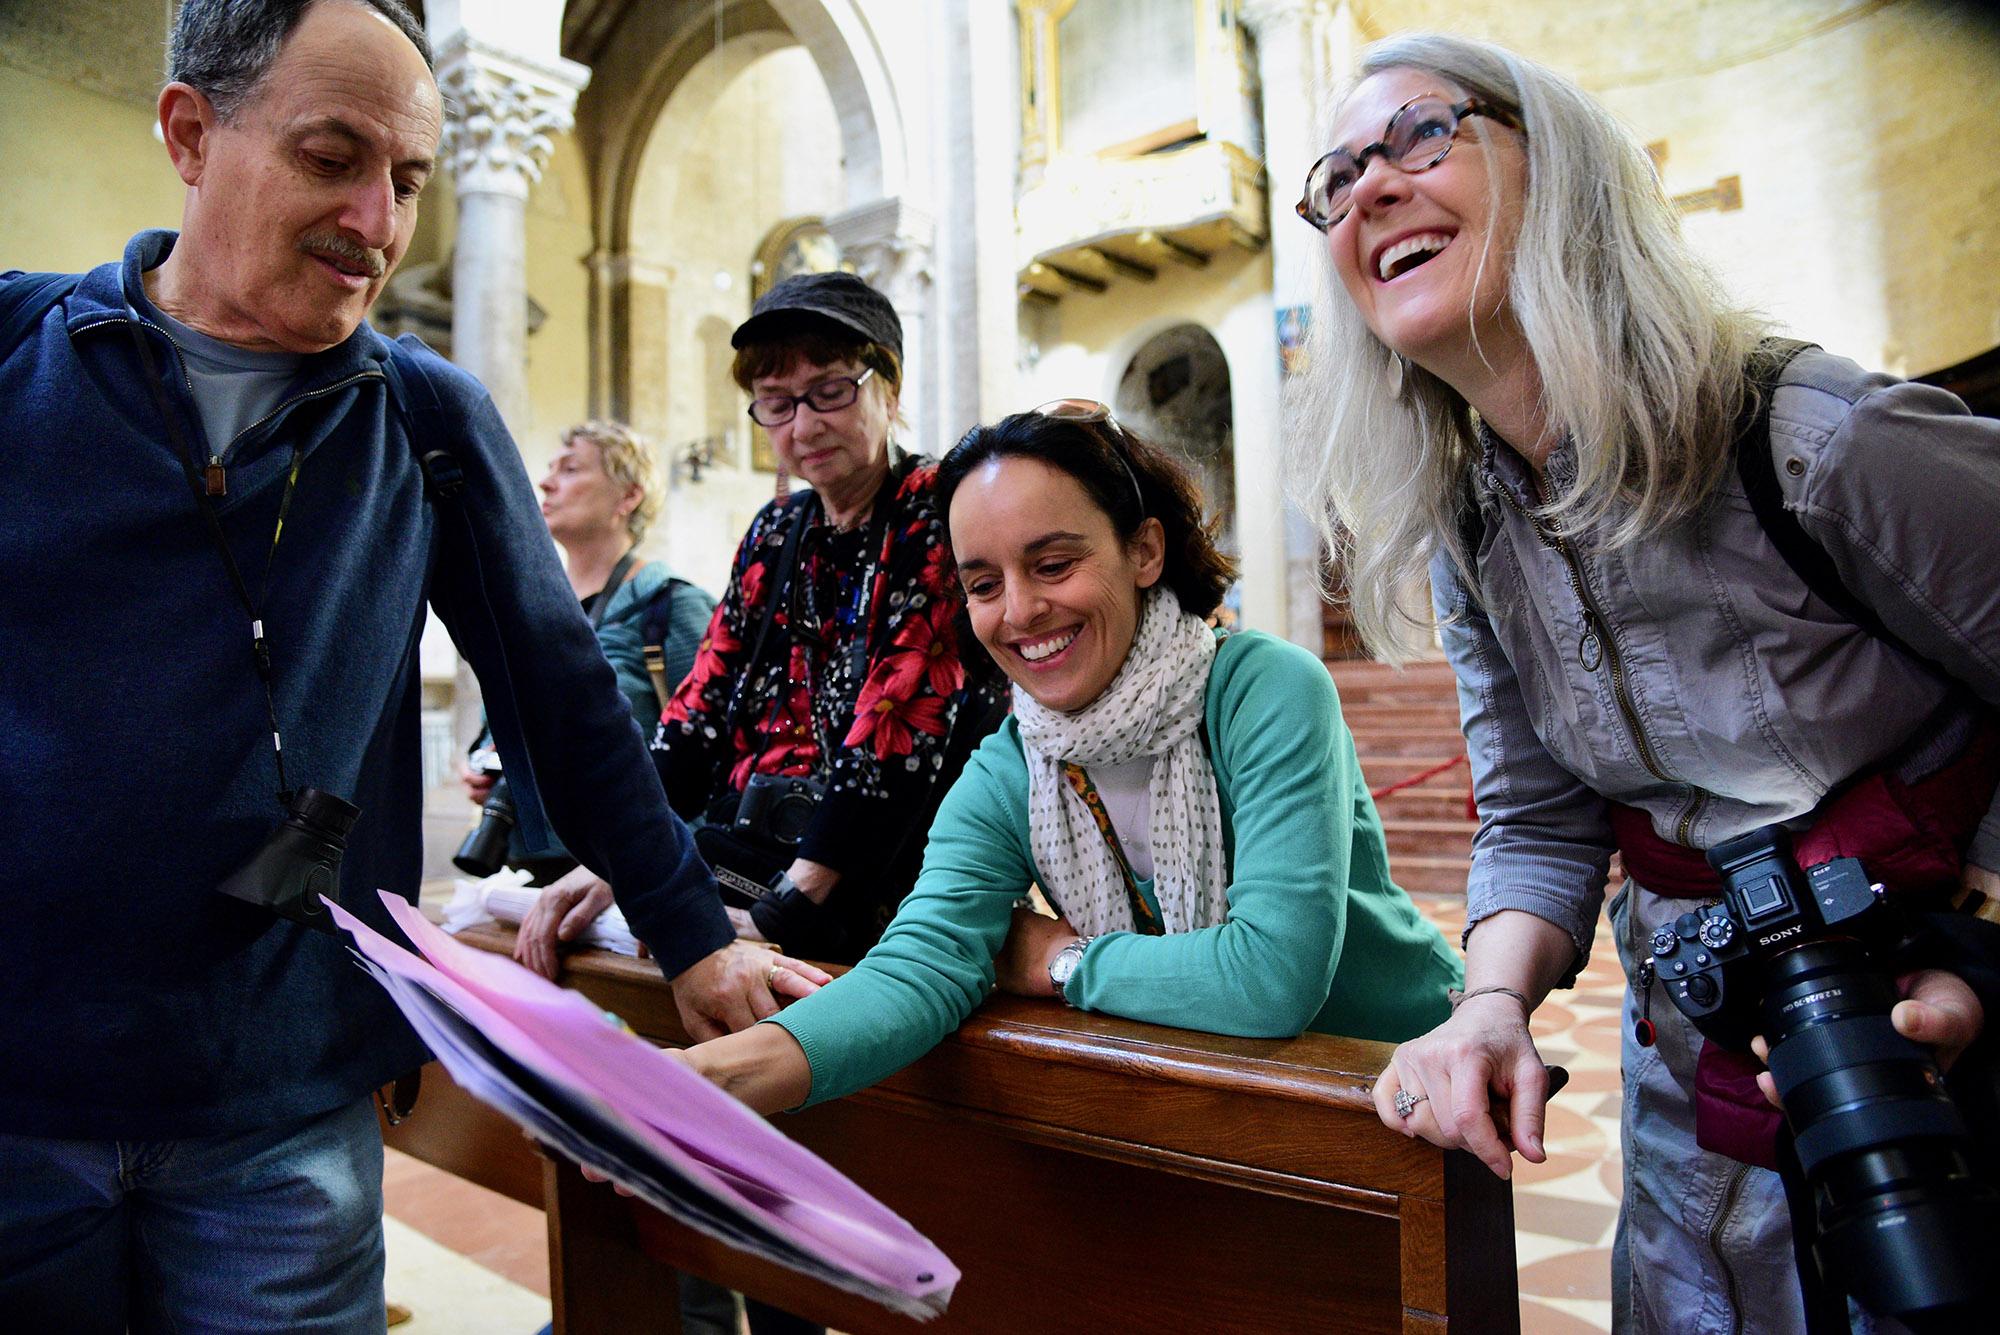 Elisa di Todiguide , guida turistica umbria